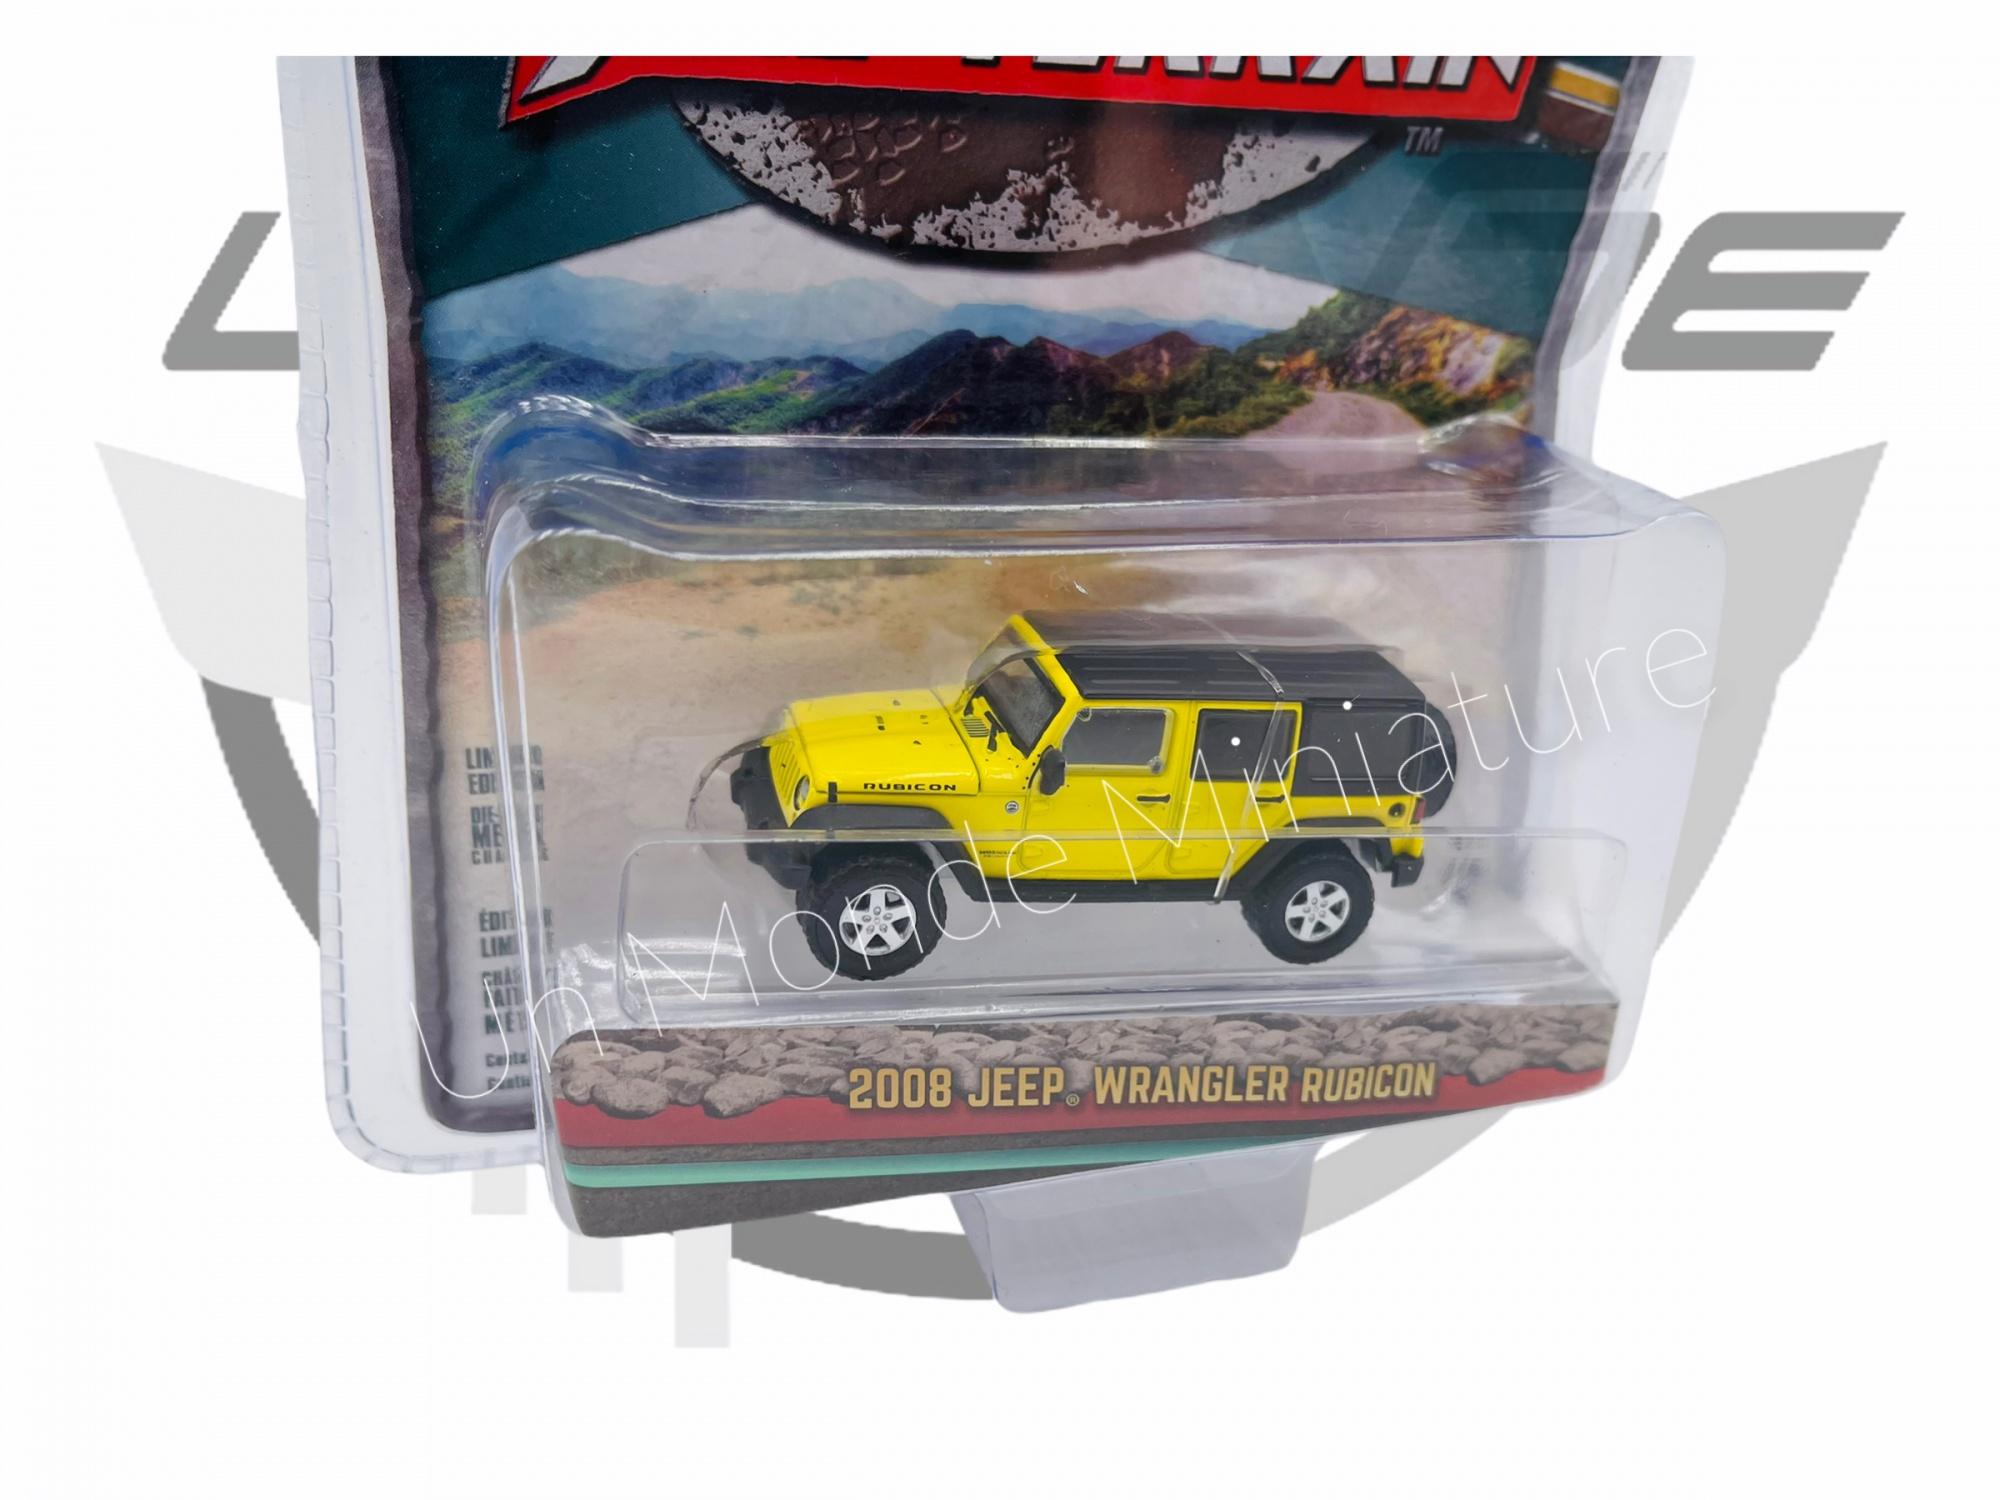 Jeep Wrangler Rubicon 2008 Yellow & Black